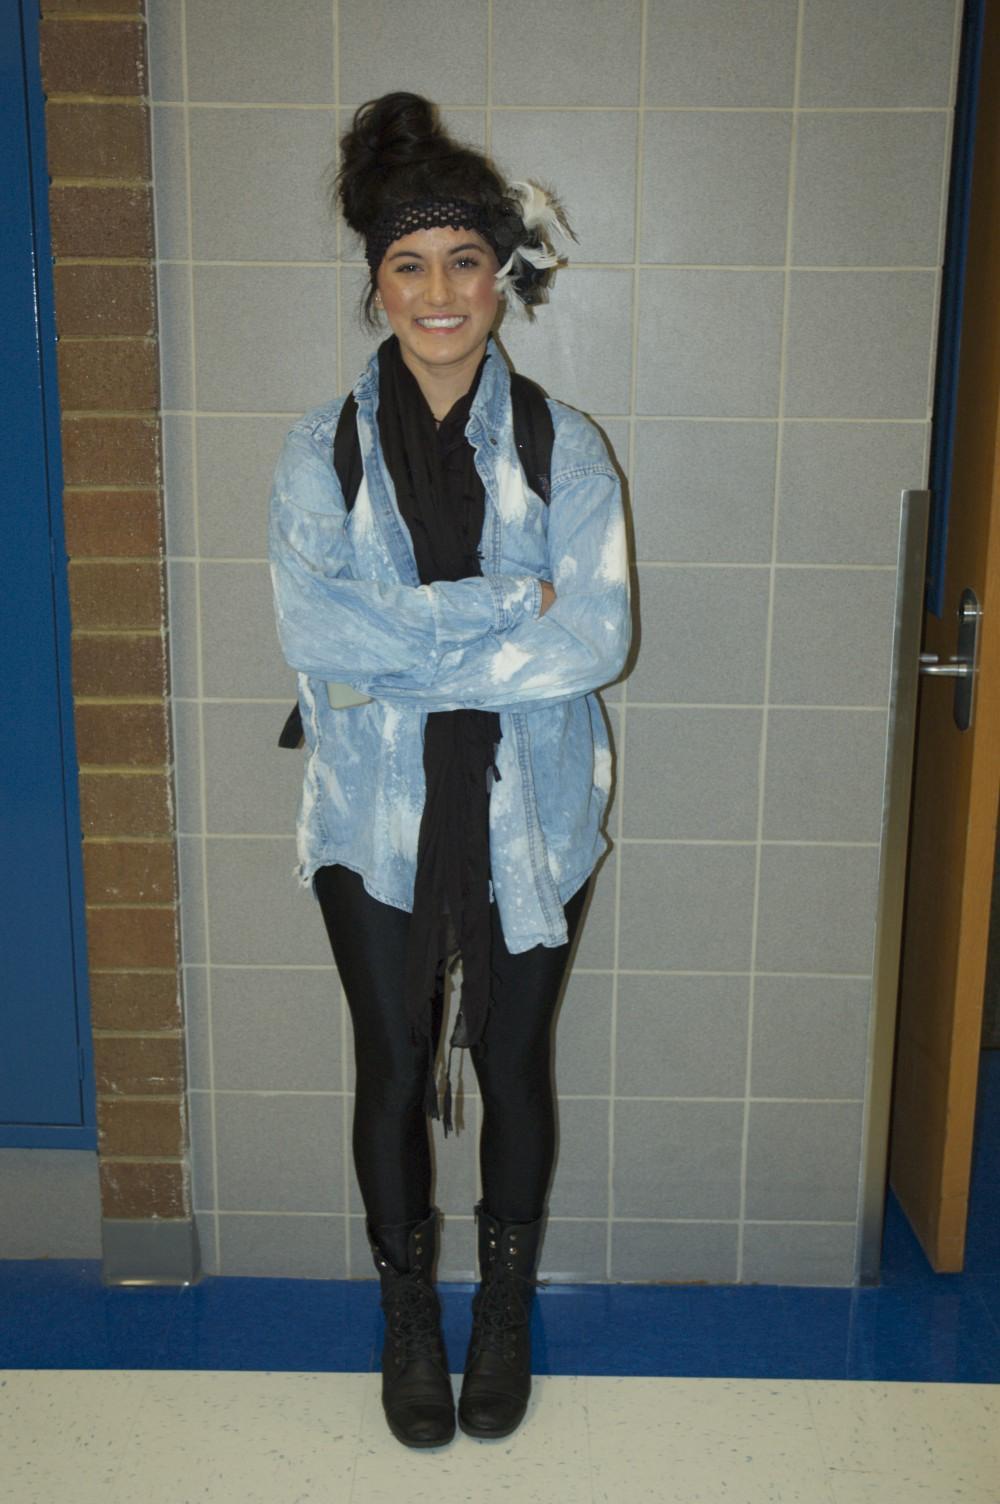 Many students like senior Chelsey Jimenez enjoy wearing leggings.